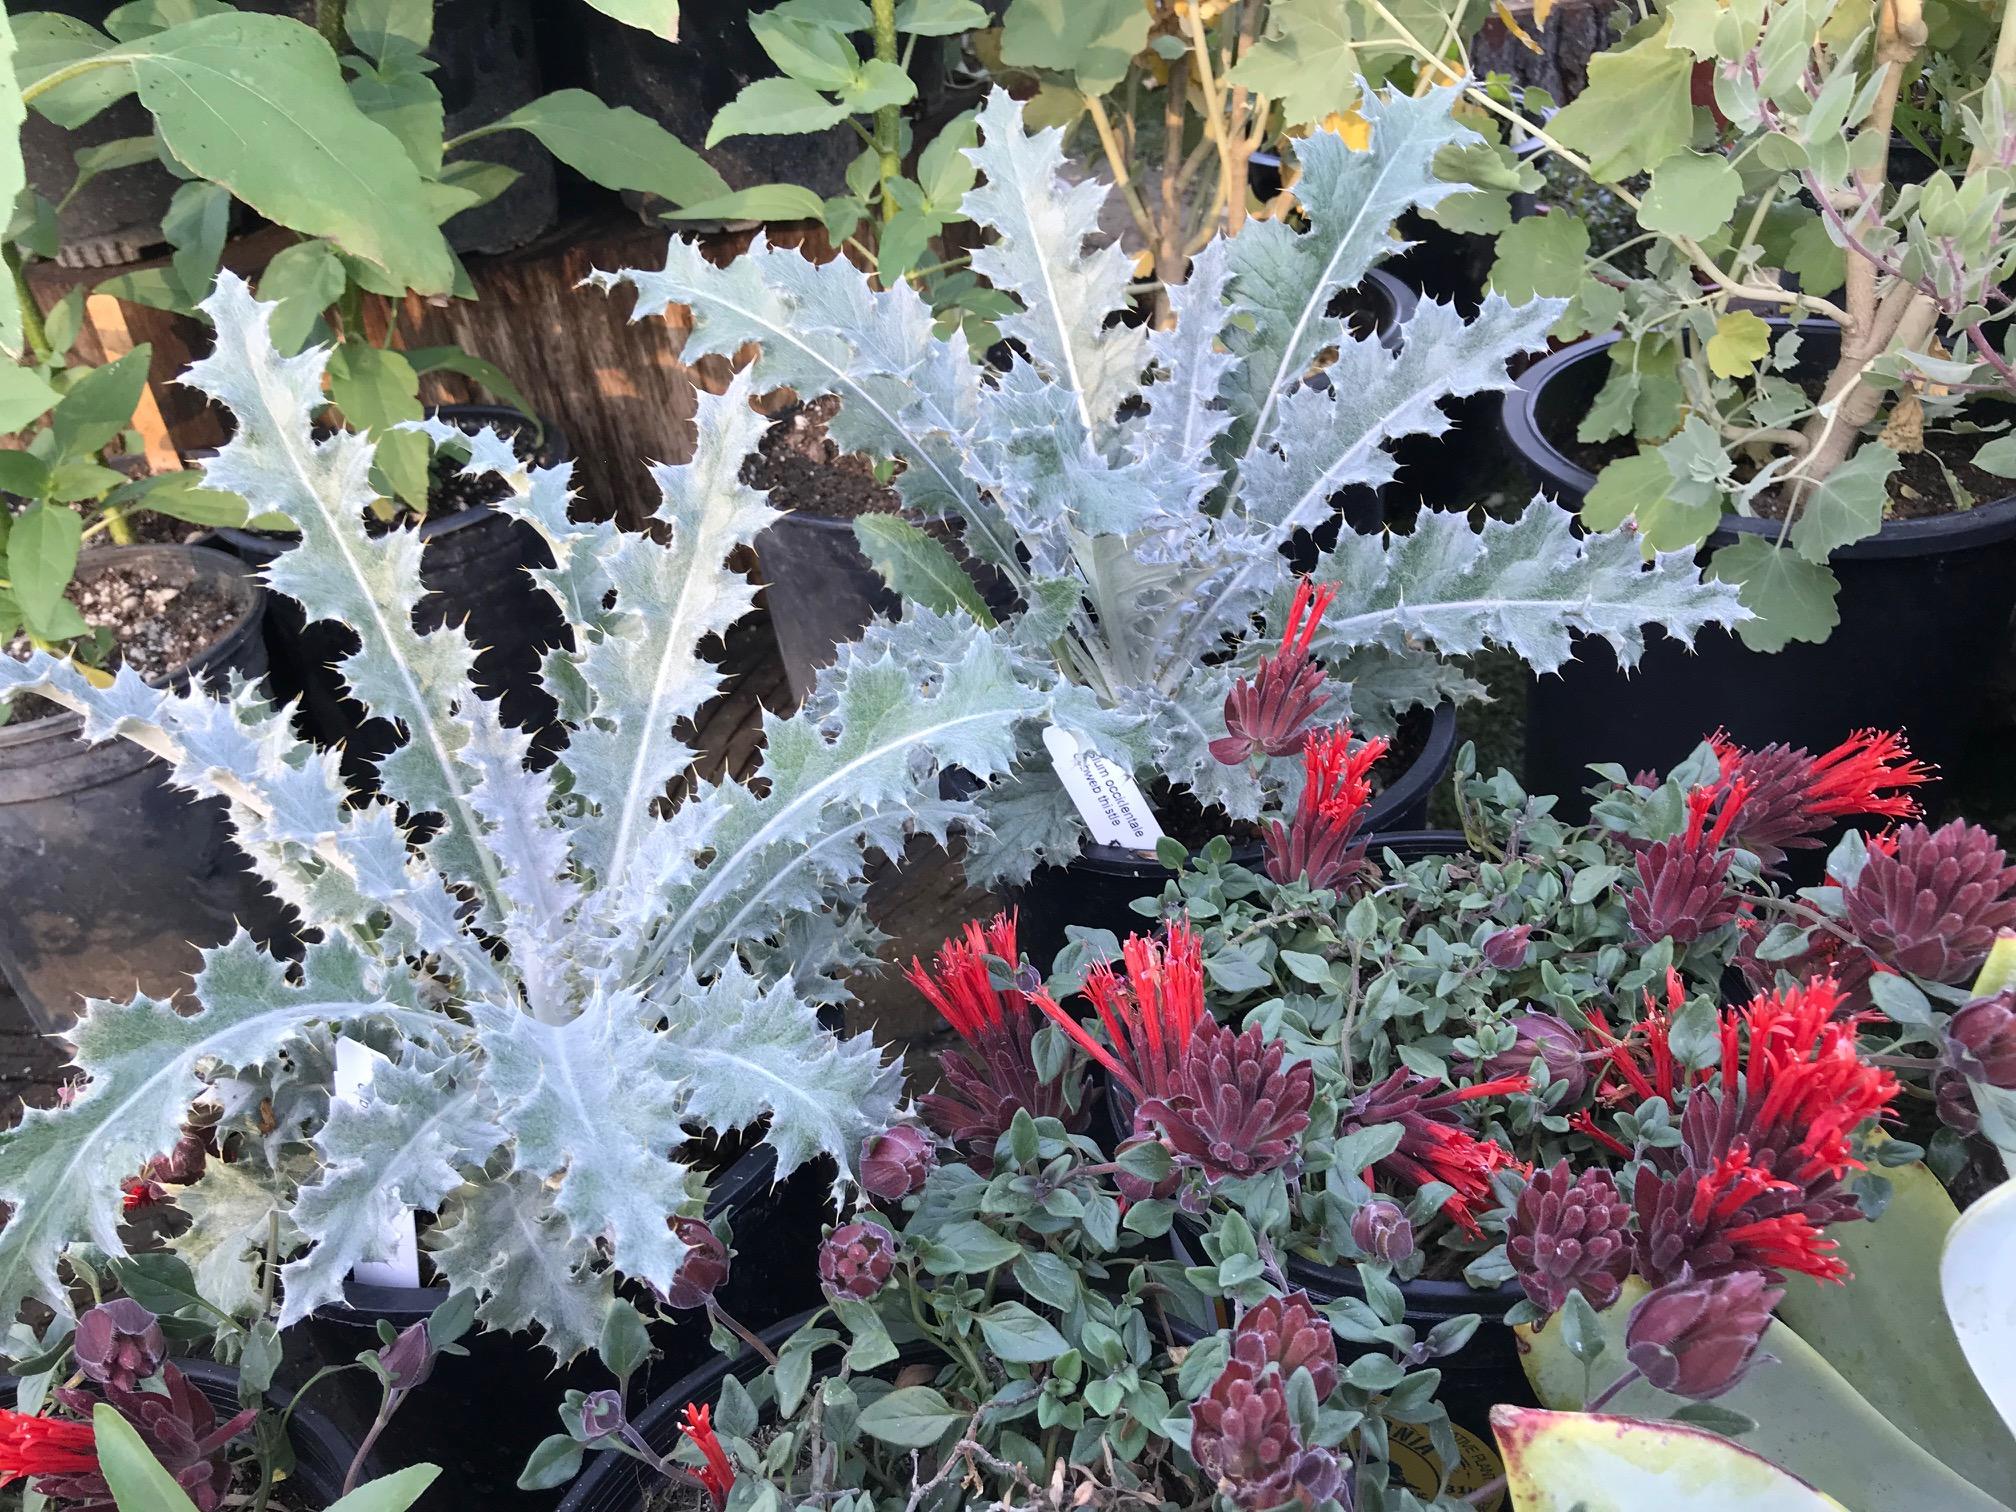 Cirsium occidentale 'Cobweb Thistle' & Monardella macrantha 'Red Monardella'